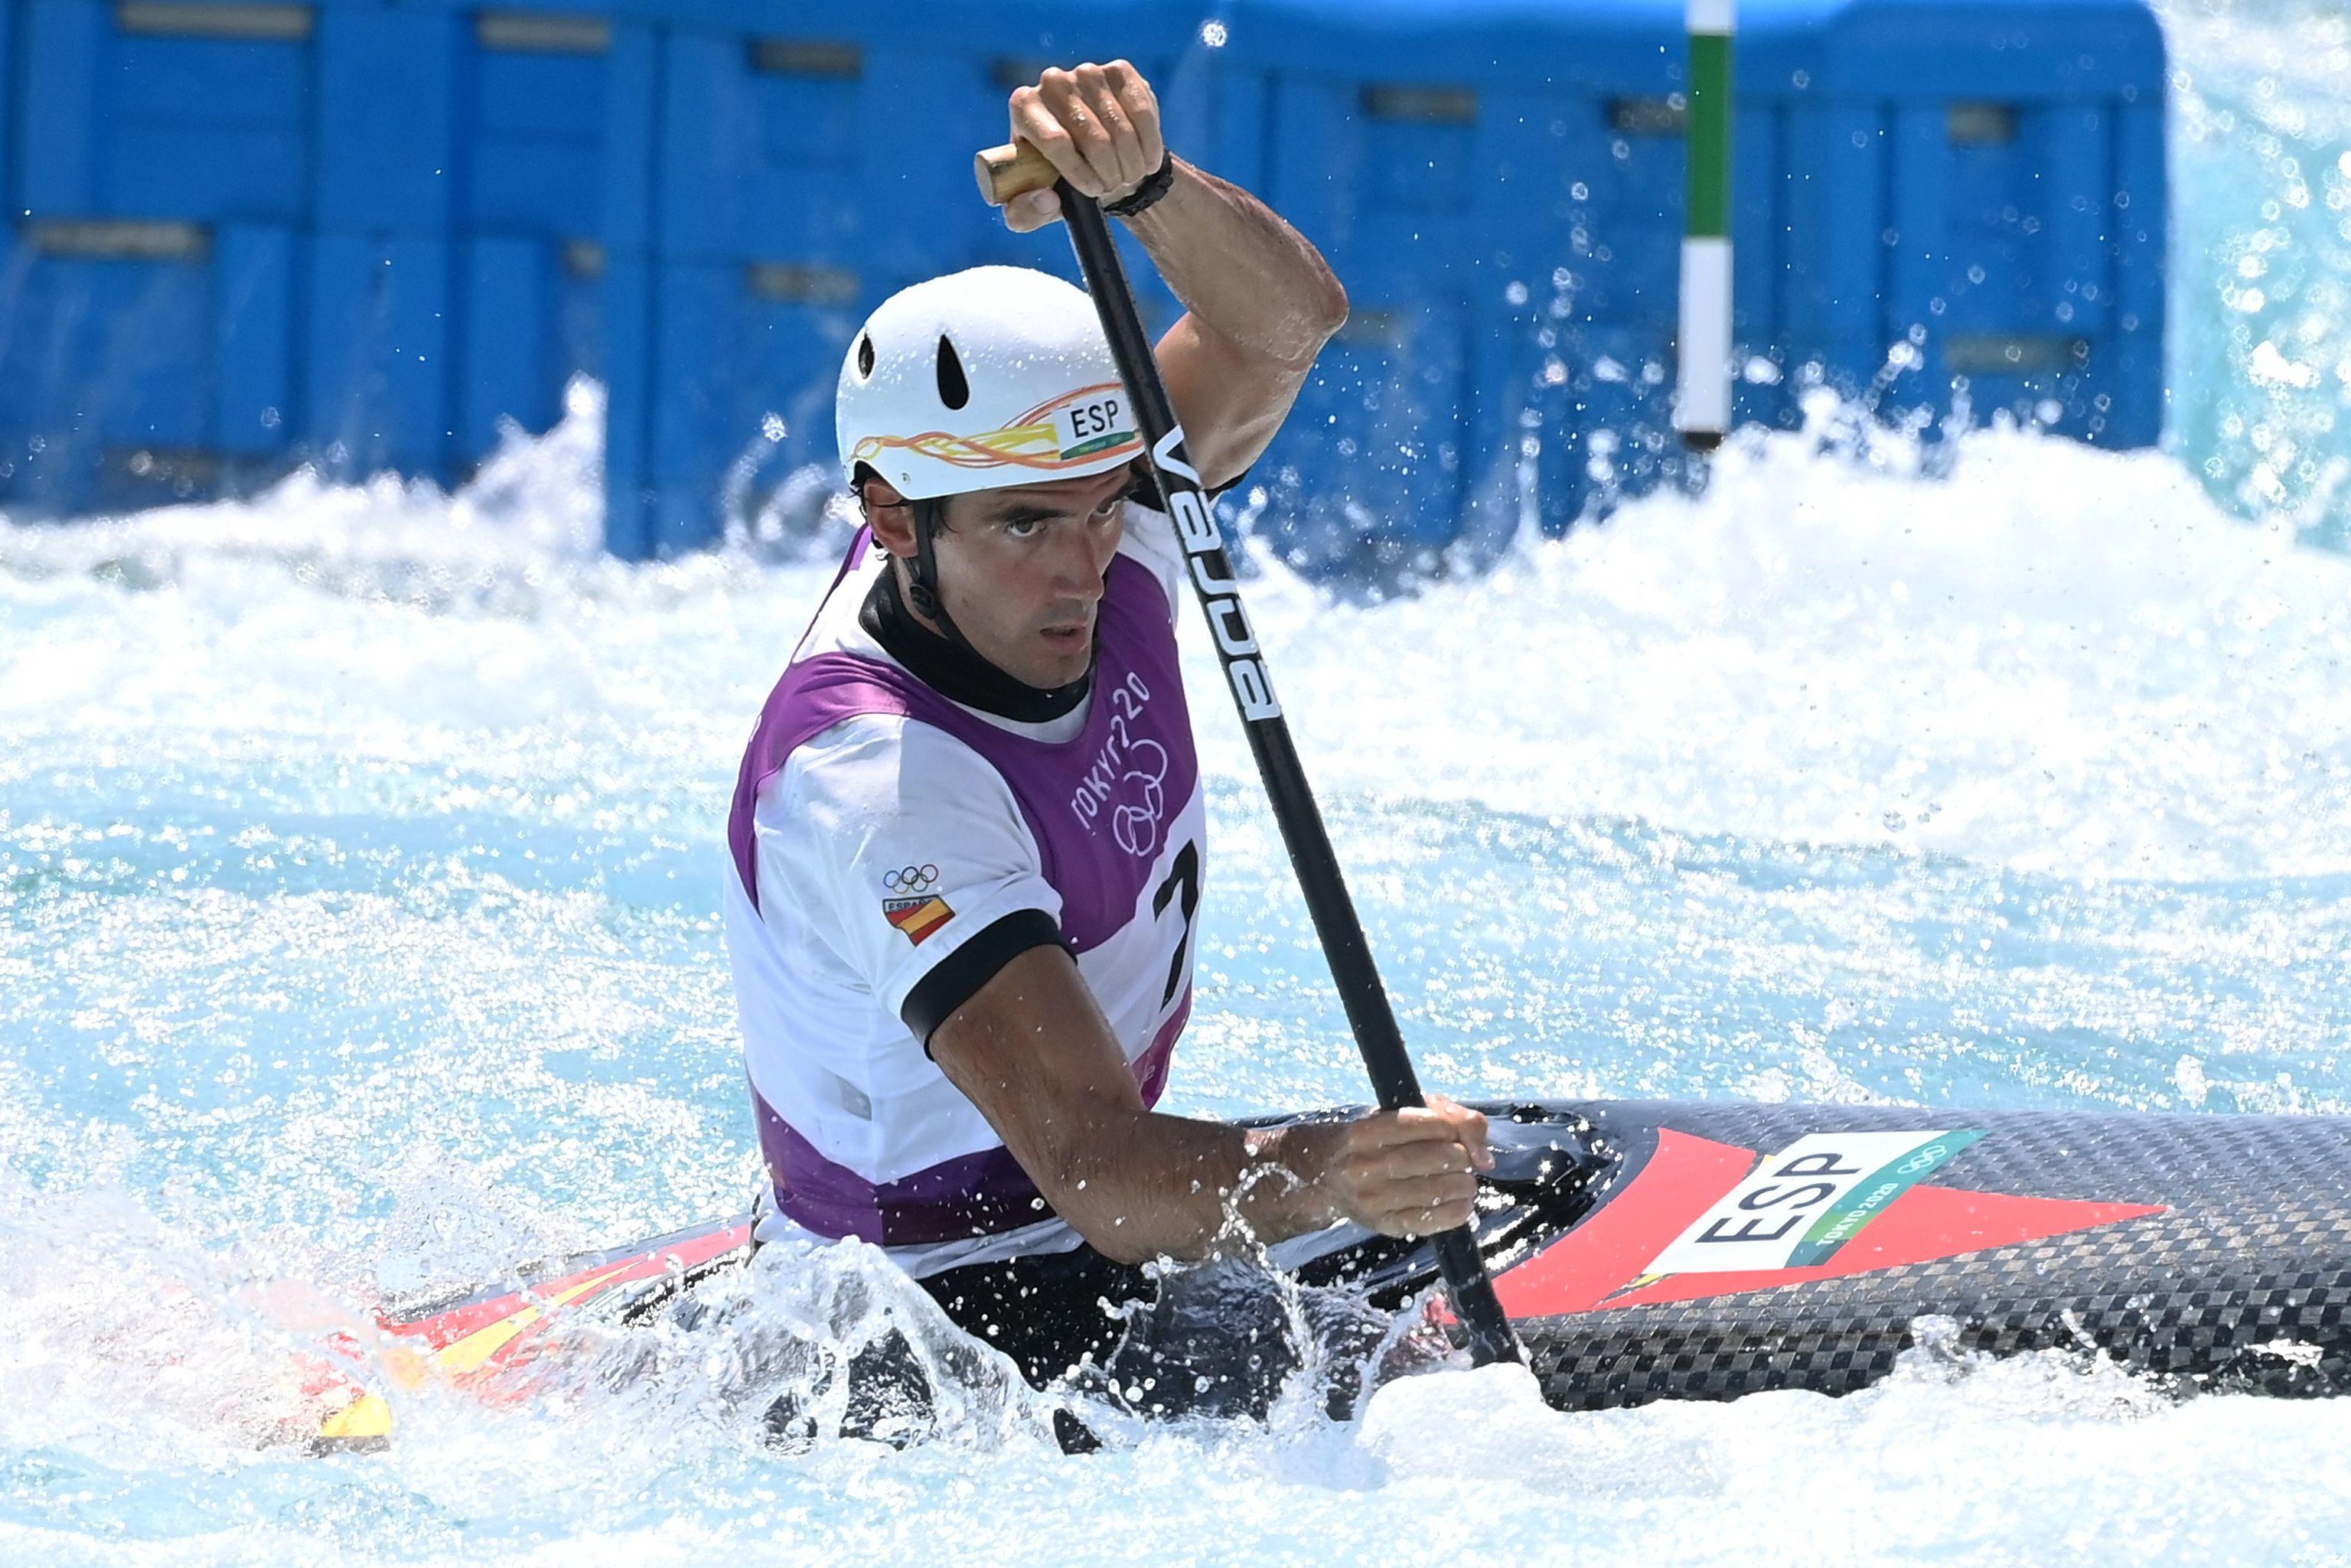 piraguismo - Juegos Olímpicos 2021 - Tokio 2020